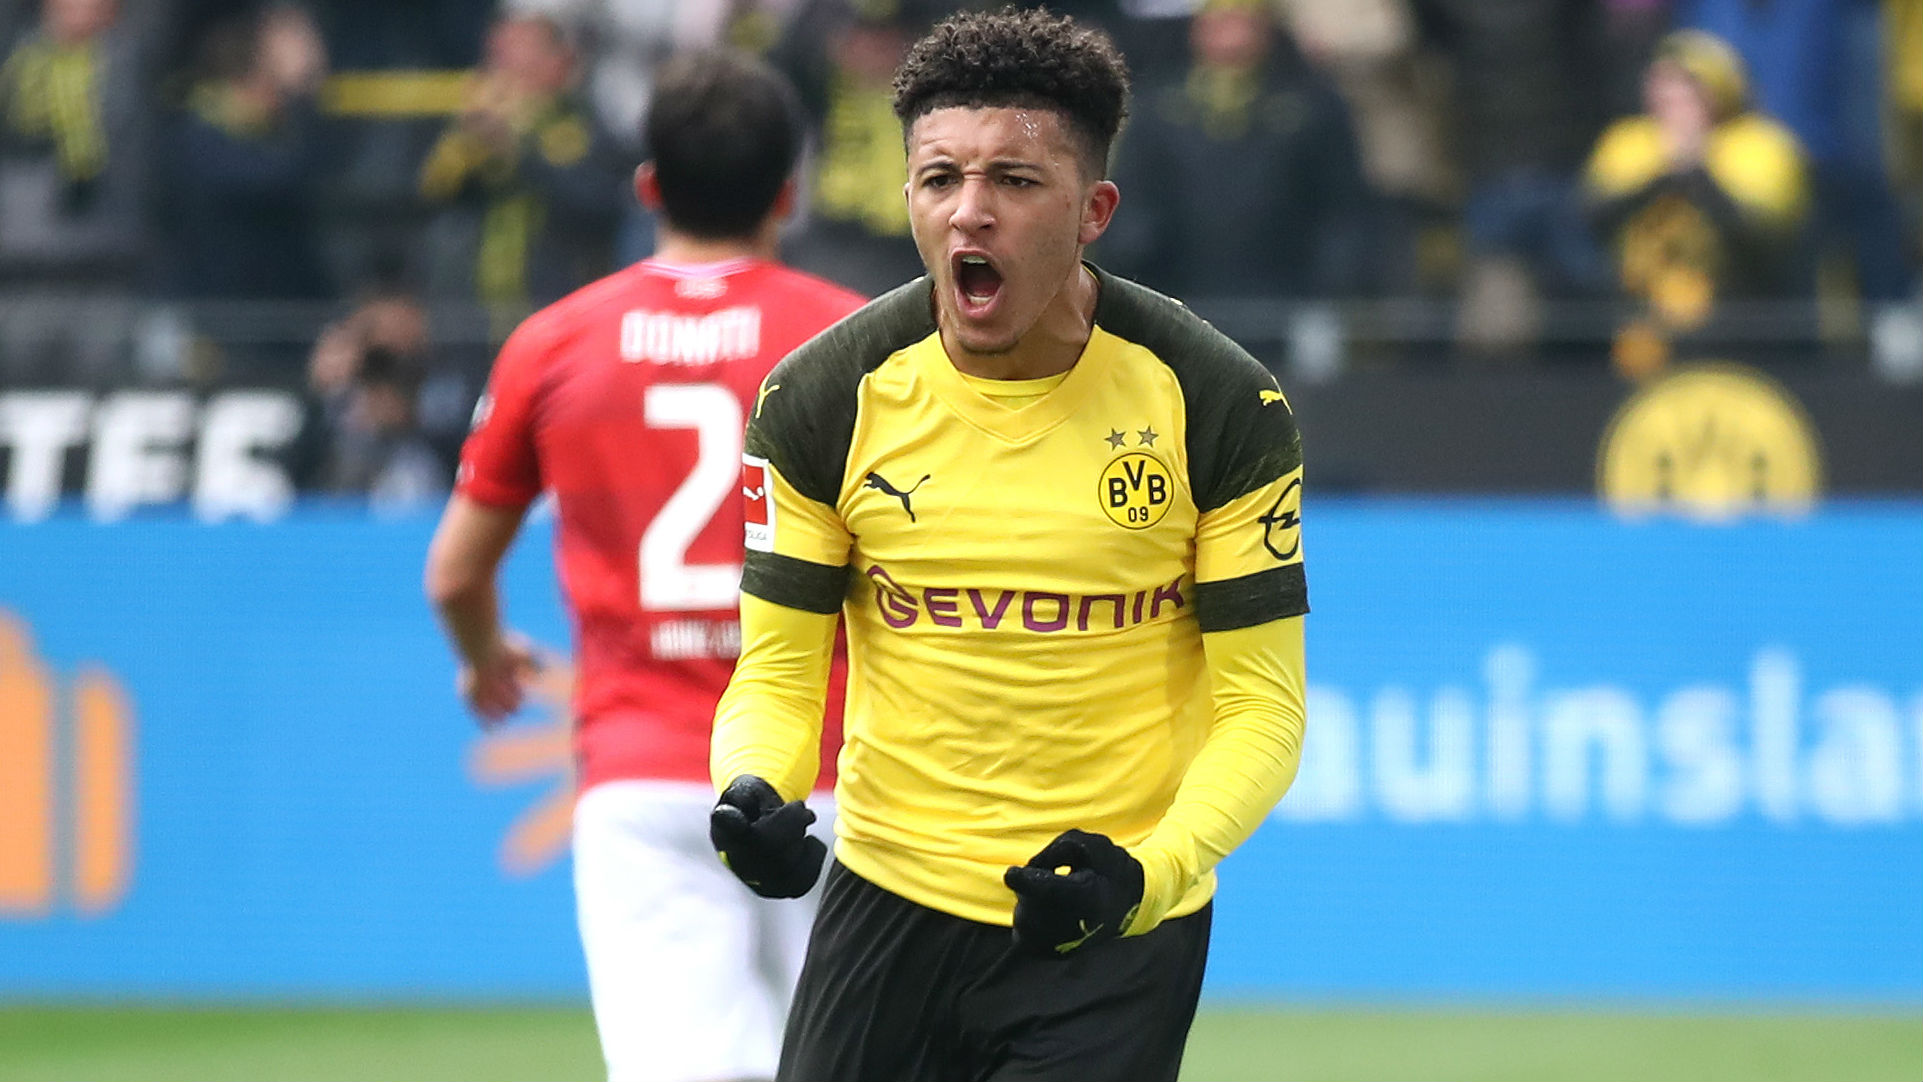 Record-setter Sancho hoping for Bayern Munich slip-up